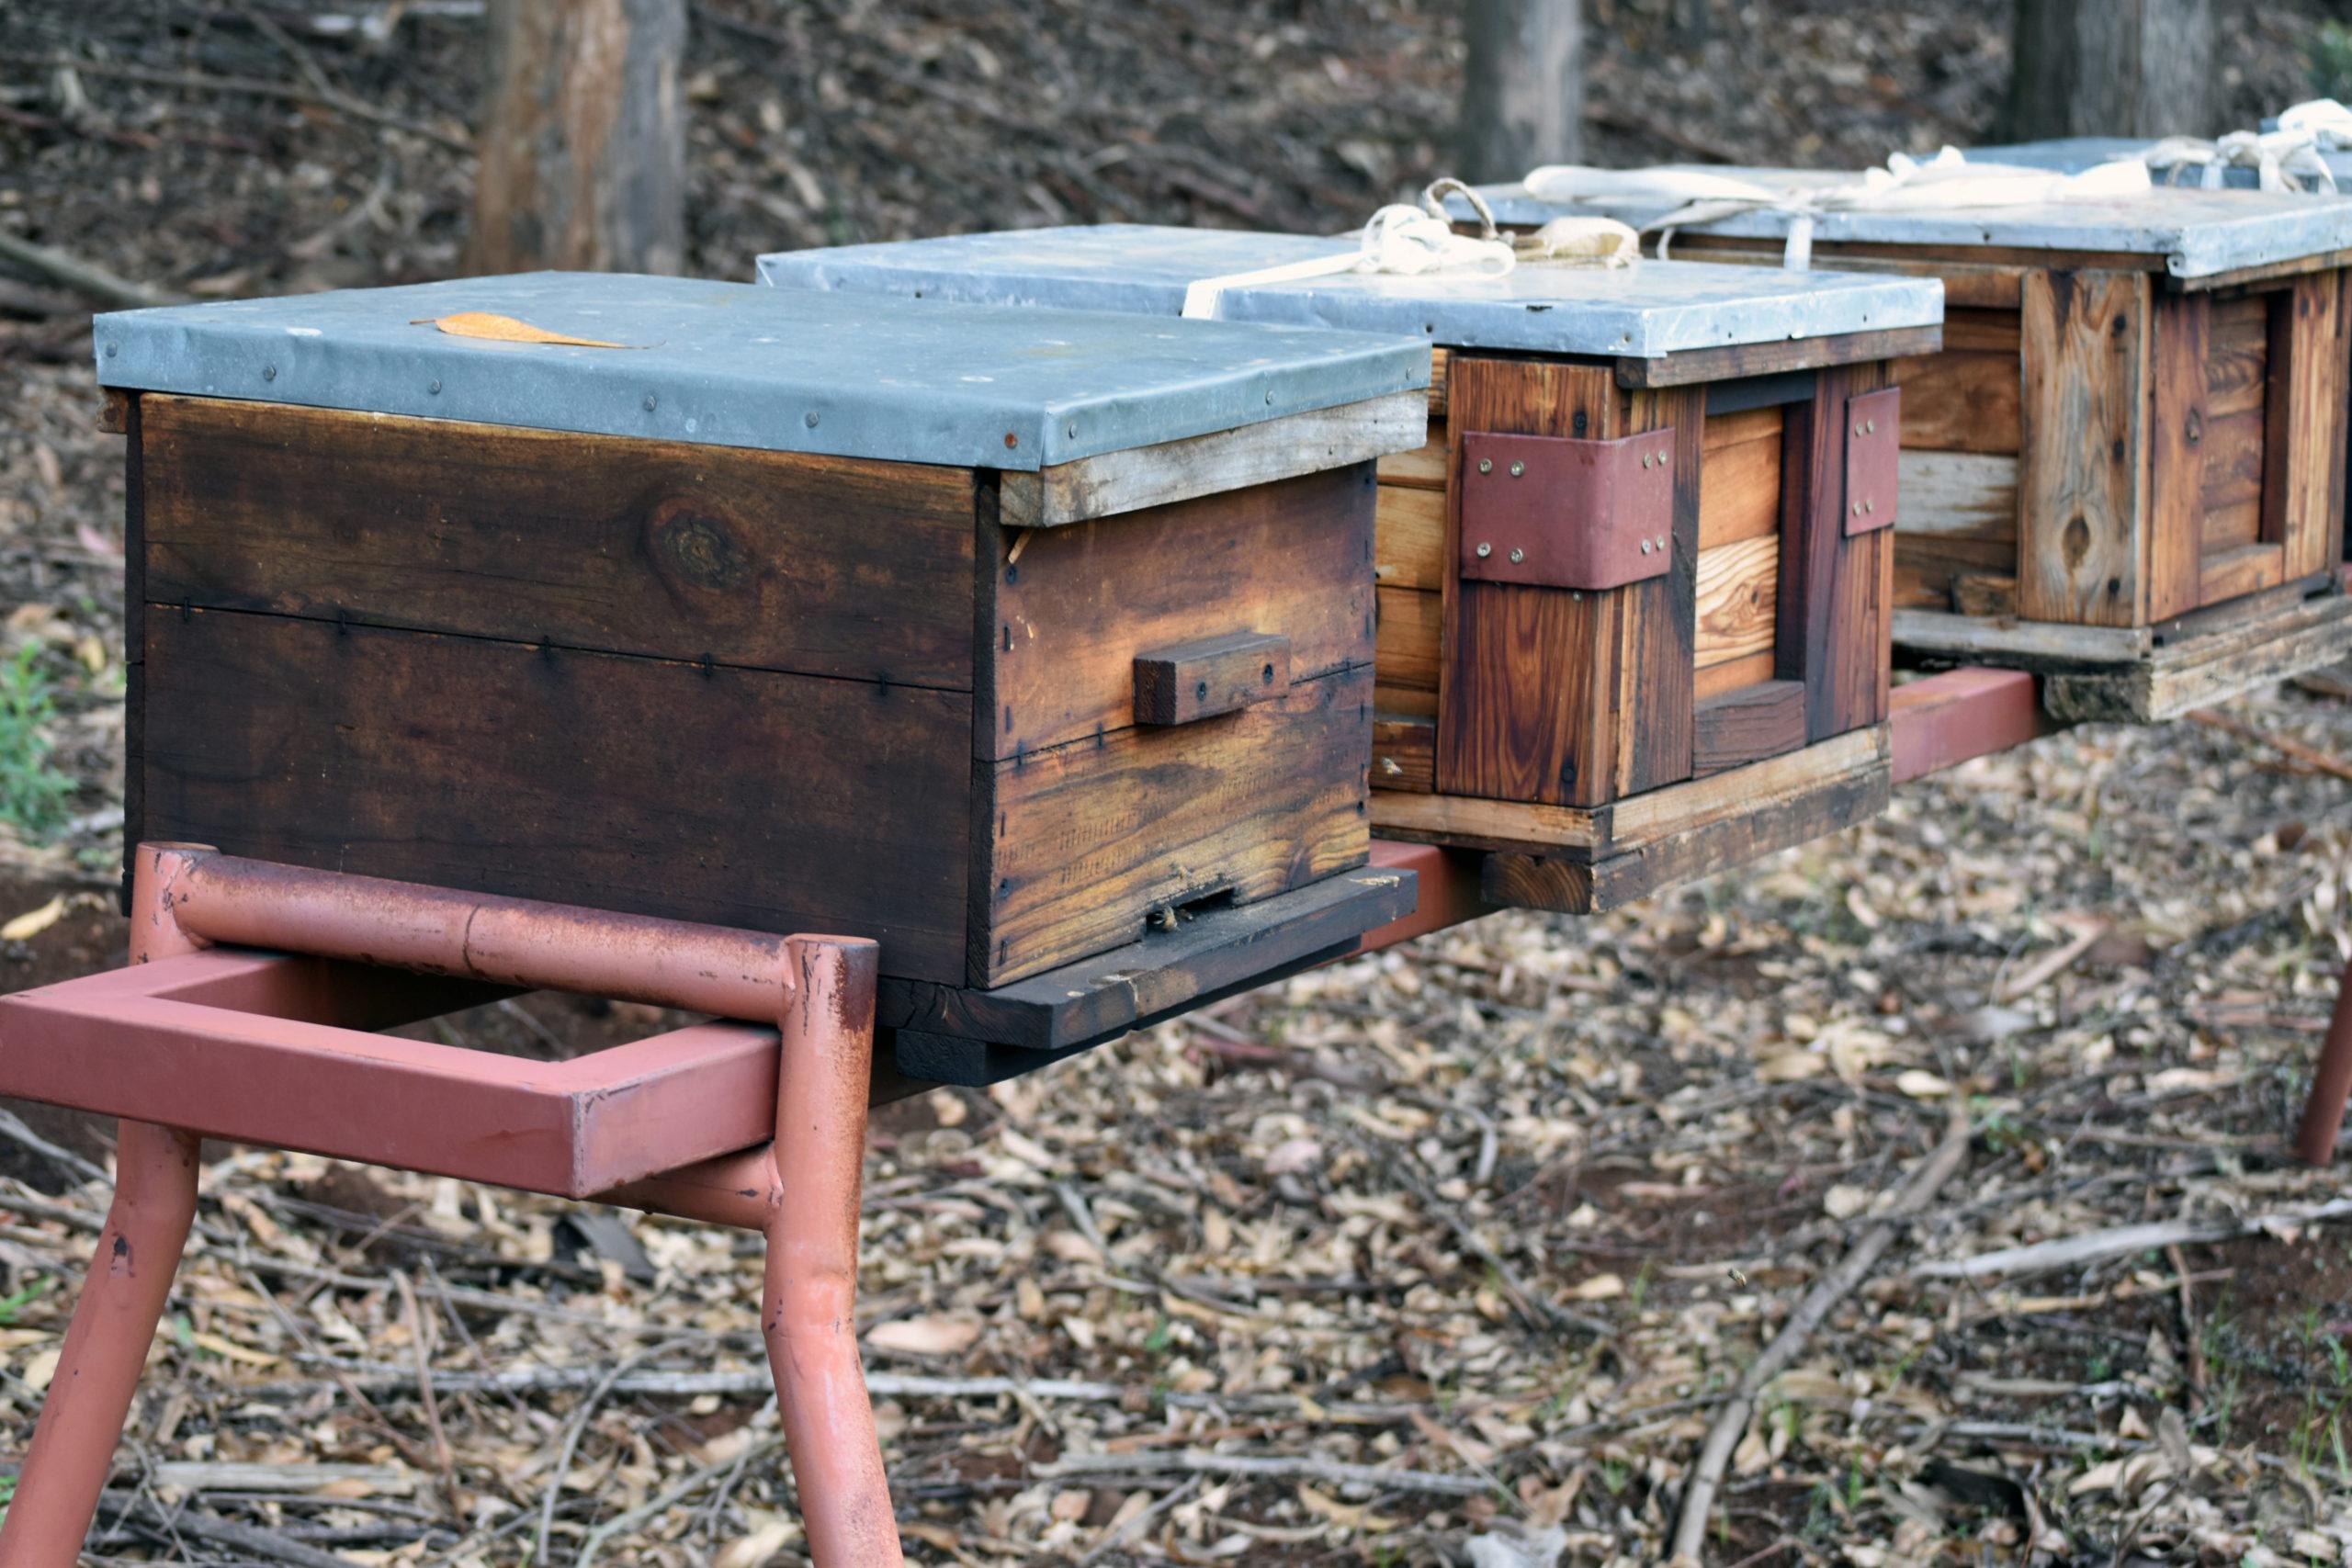 20 May – Celebrating World Bee Day